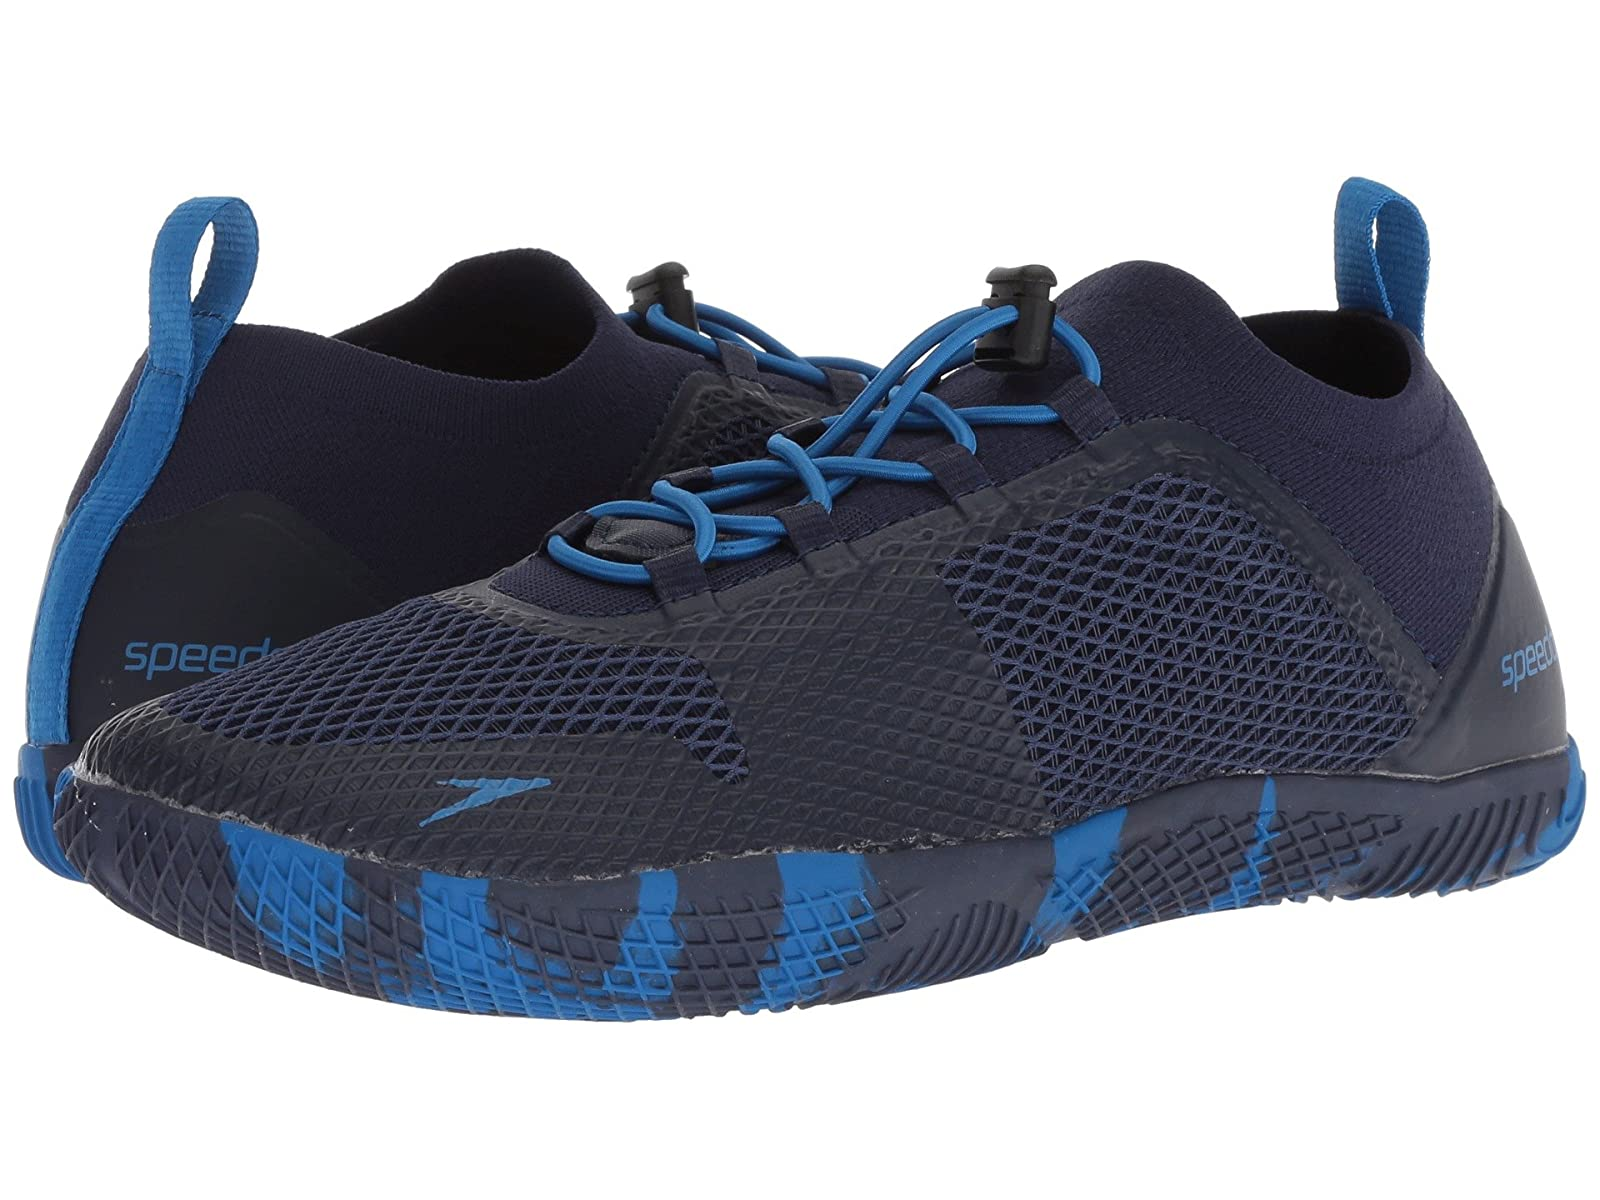 Speedo Fathom AQAtmospheric grades have affordable shoes